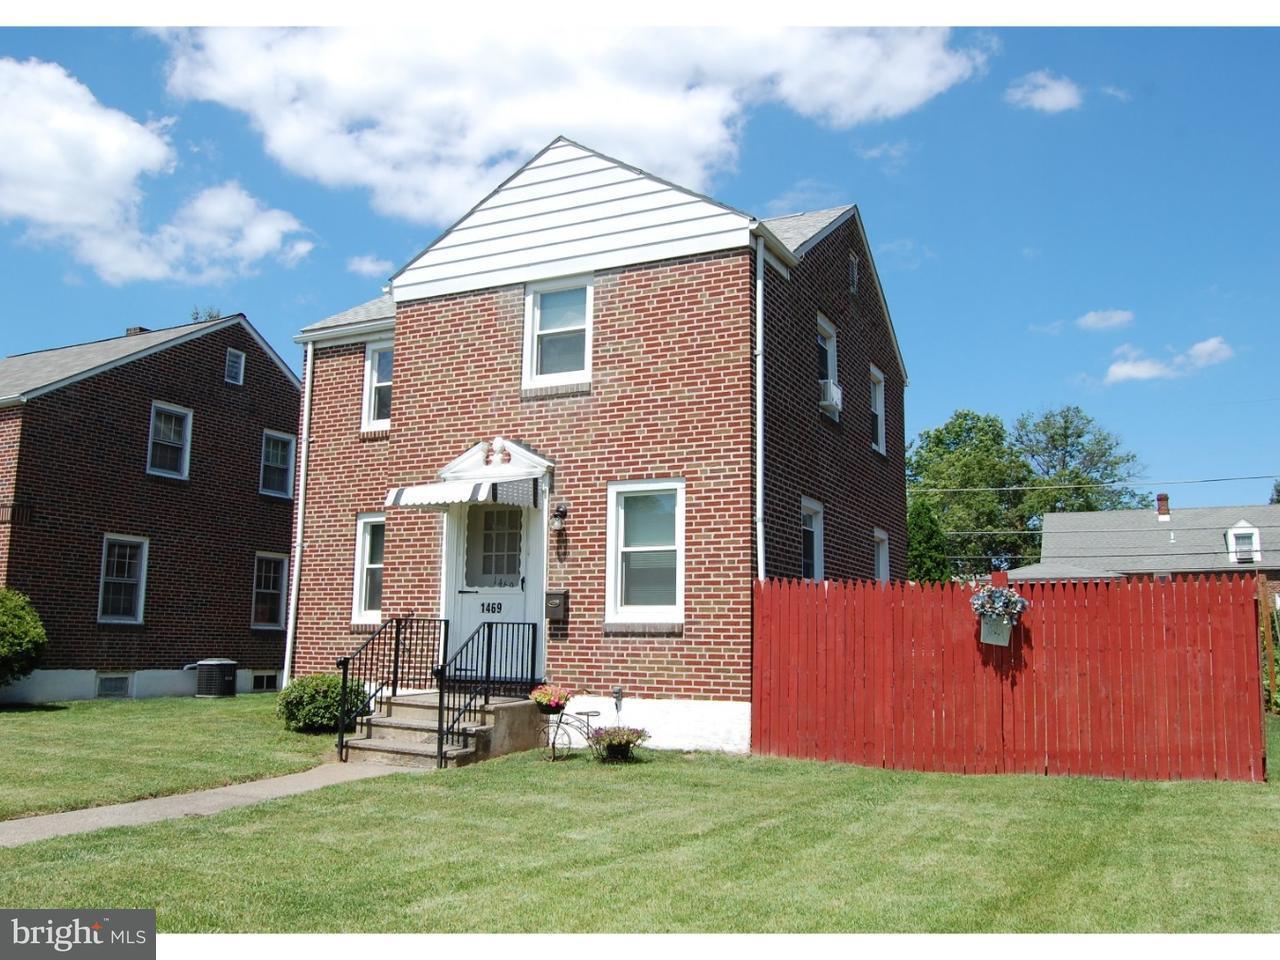 Casa Unifamiliar por un Alquiler en 1469 CHERRY Lane Pottstown, Pennsylvania 19464 Estados Unidos